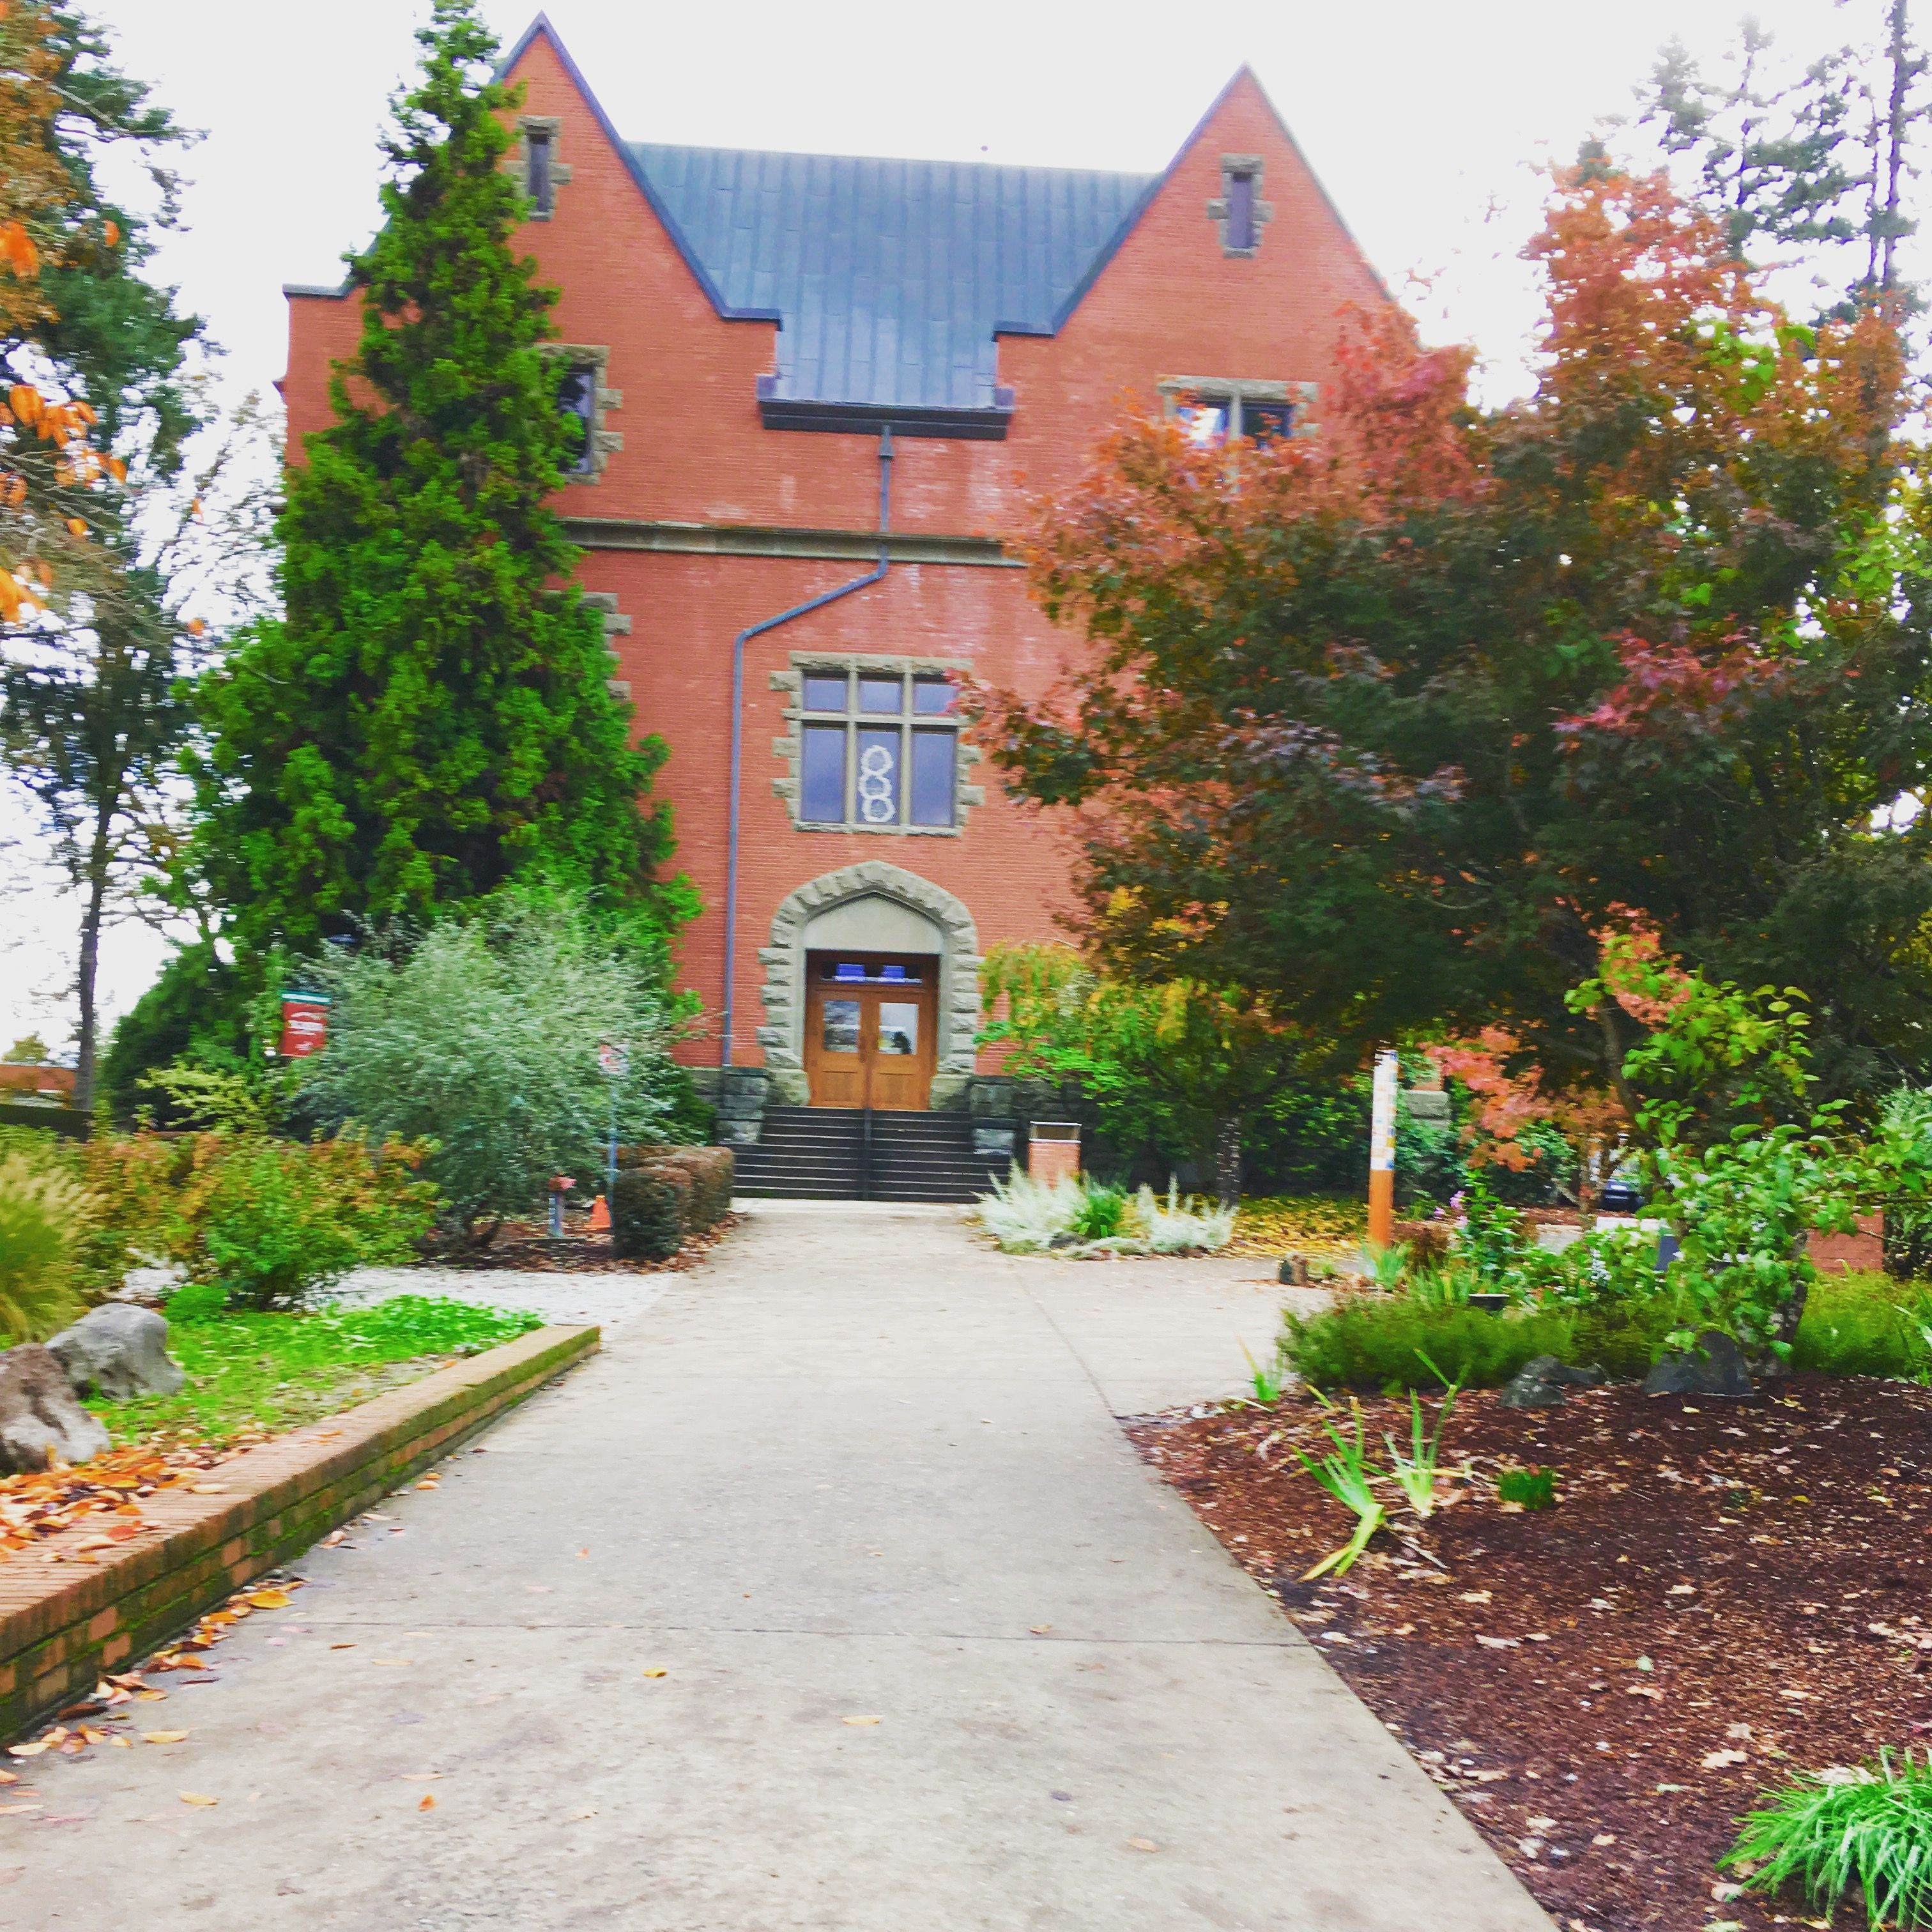 Pacific University Forest Grove Oregon Oregon Waterfalls Scenery Photos Northwest College